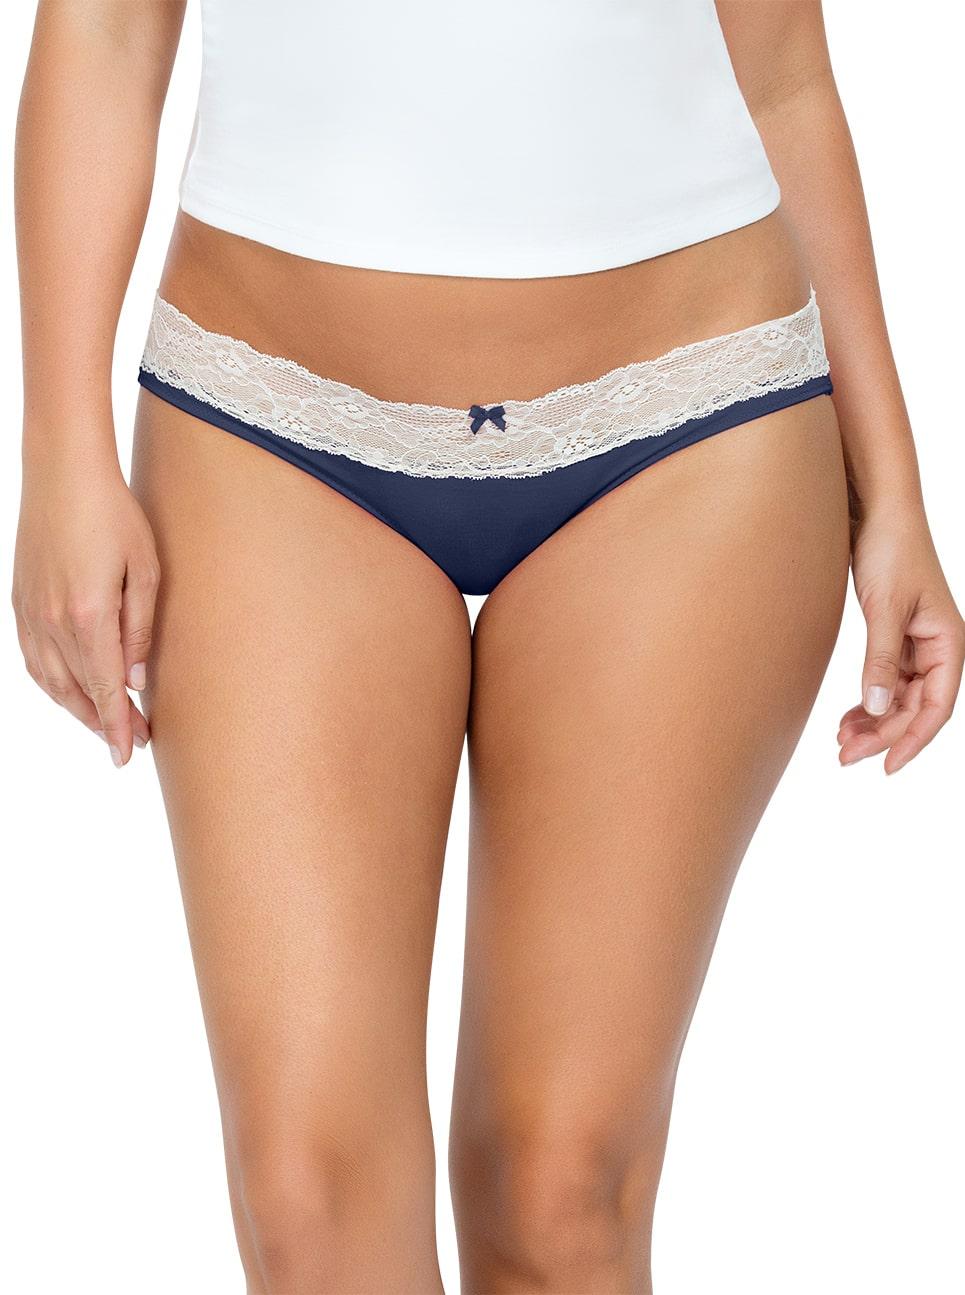 PARFAIT ParfaitPanty SoEssential BikiniPP303 NavyBlue Front close - Parfait Panty So Essential Bikini- Navy - PP303